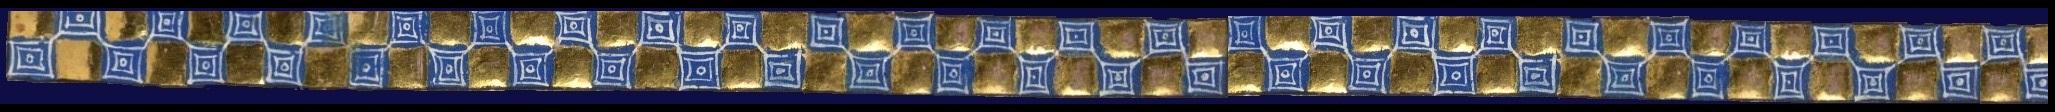 border blue on gold chequer Brit.Lib Add MS 42130 f80r long